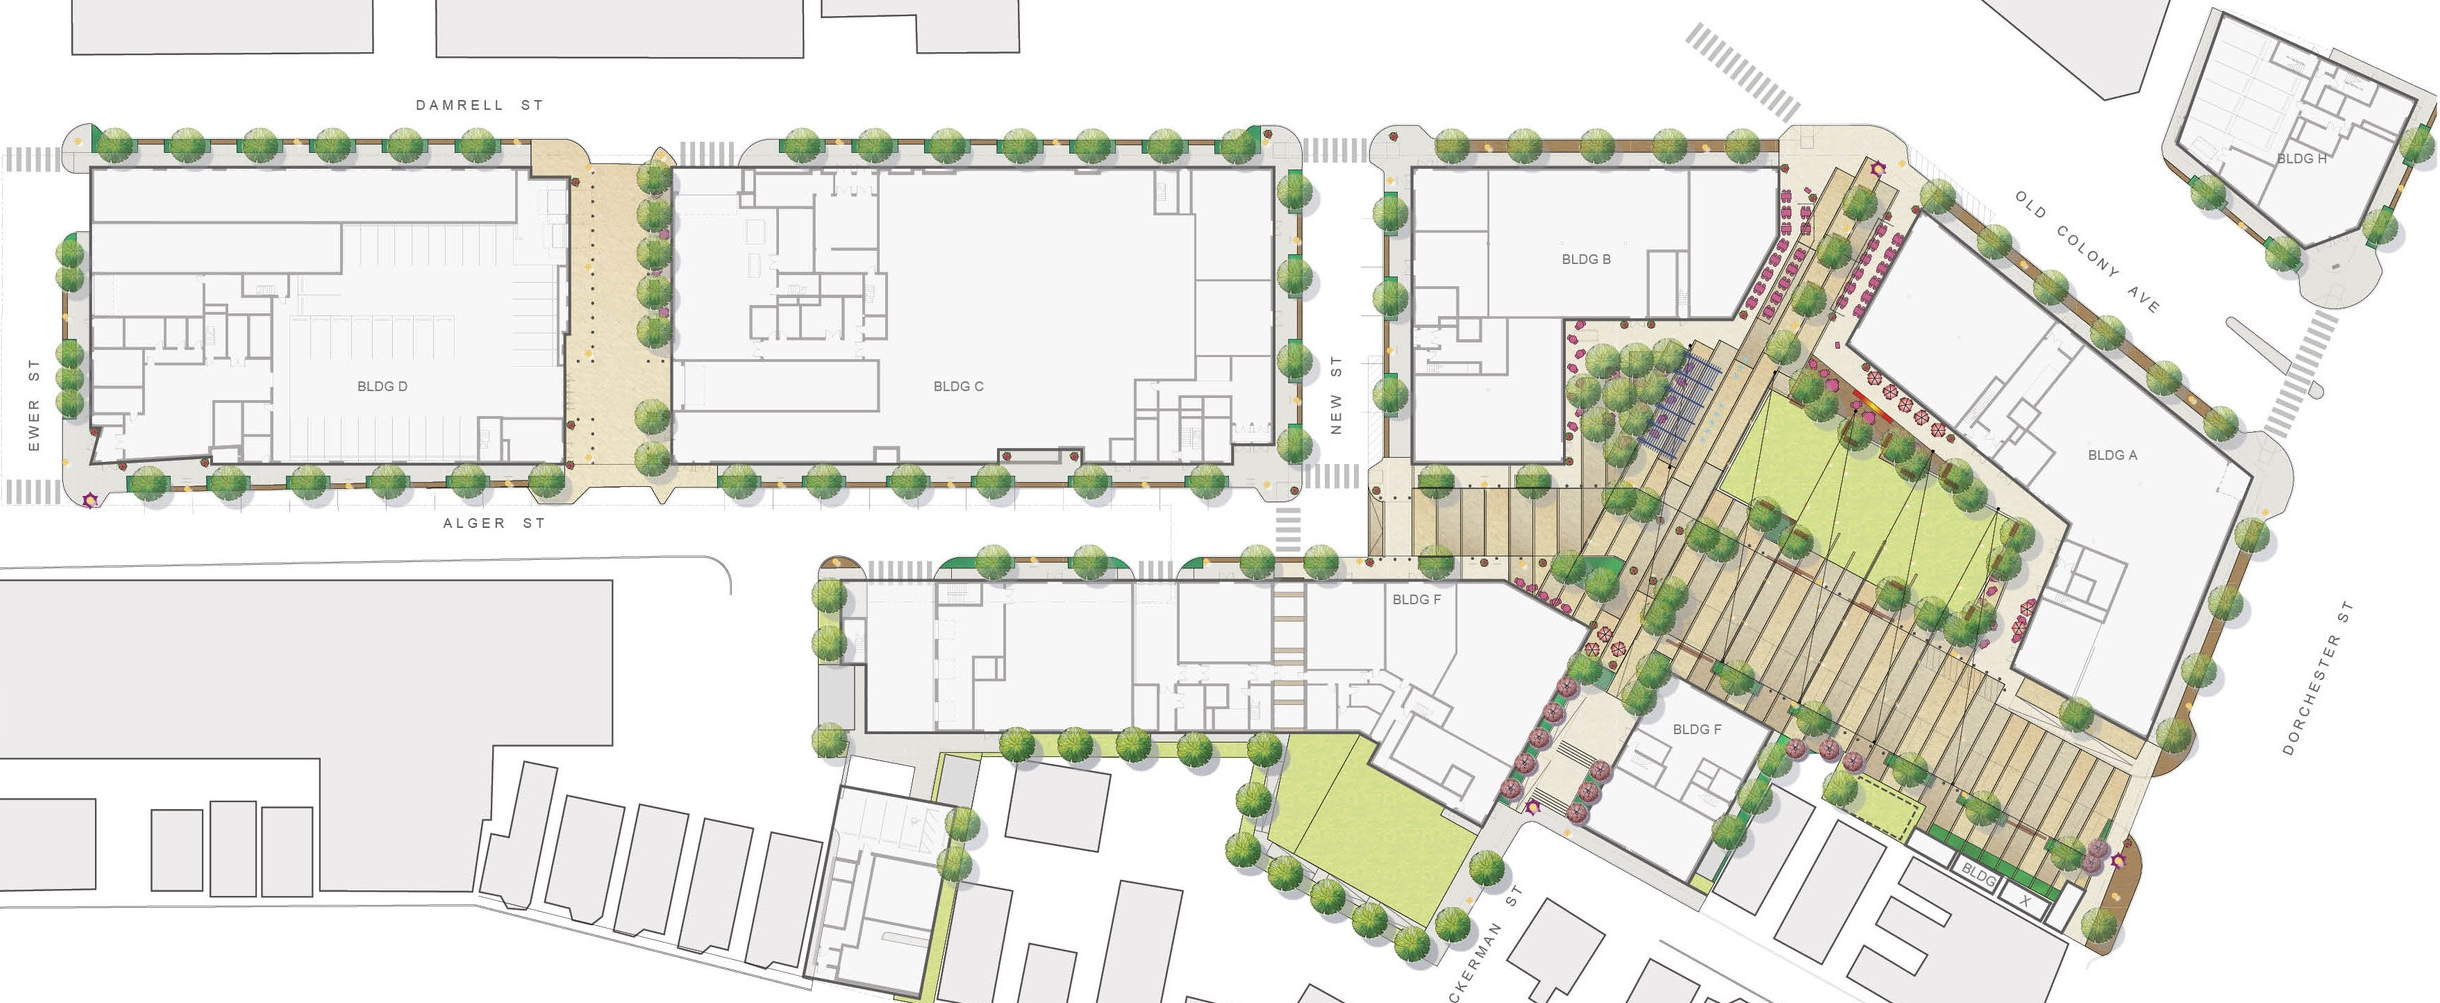 Washington Village Site Plan (Halvorson Design)